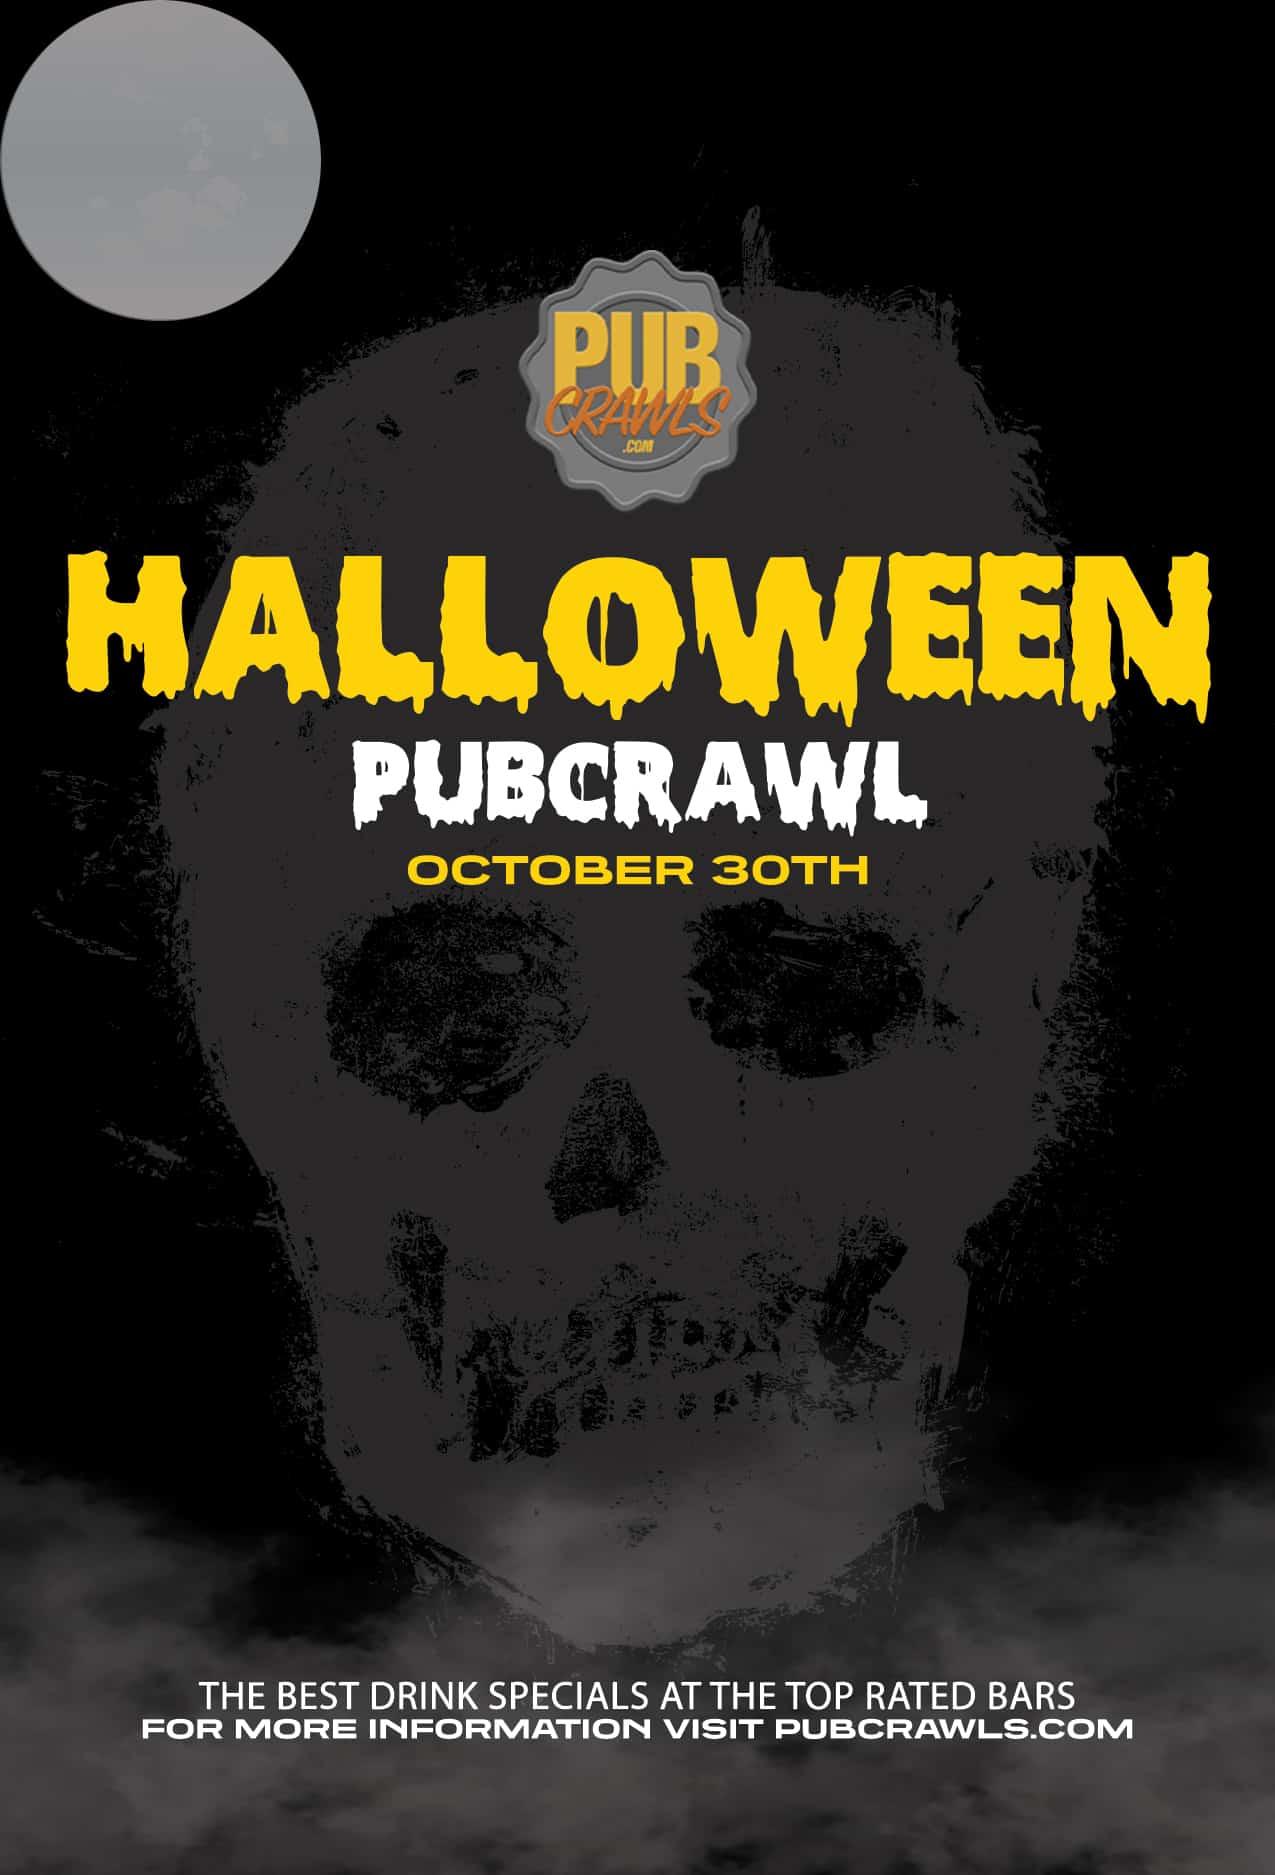 Houston Halloween Fright Night Pub Crawl